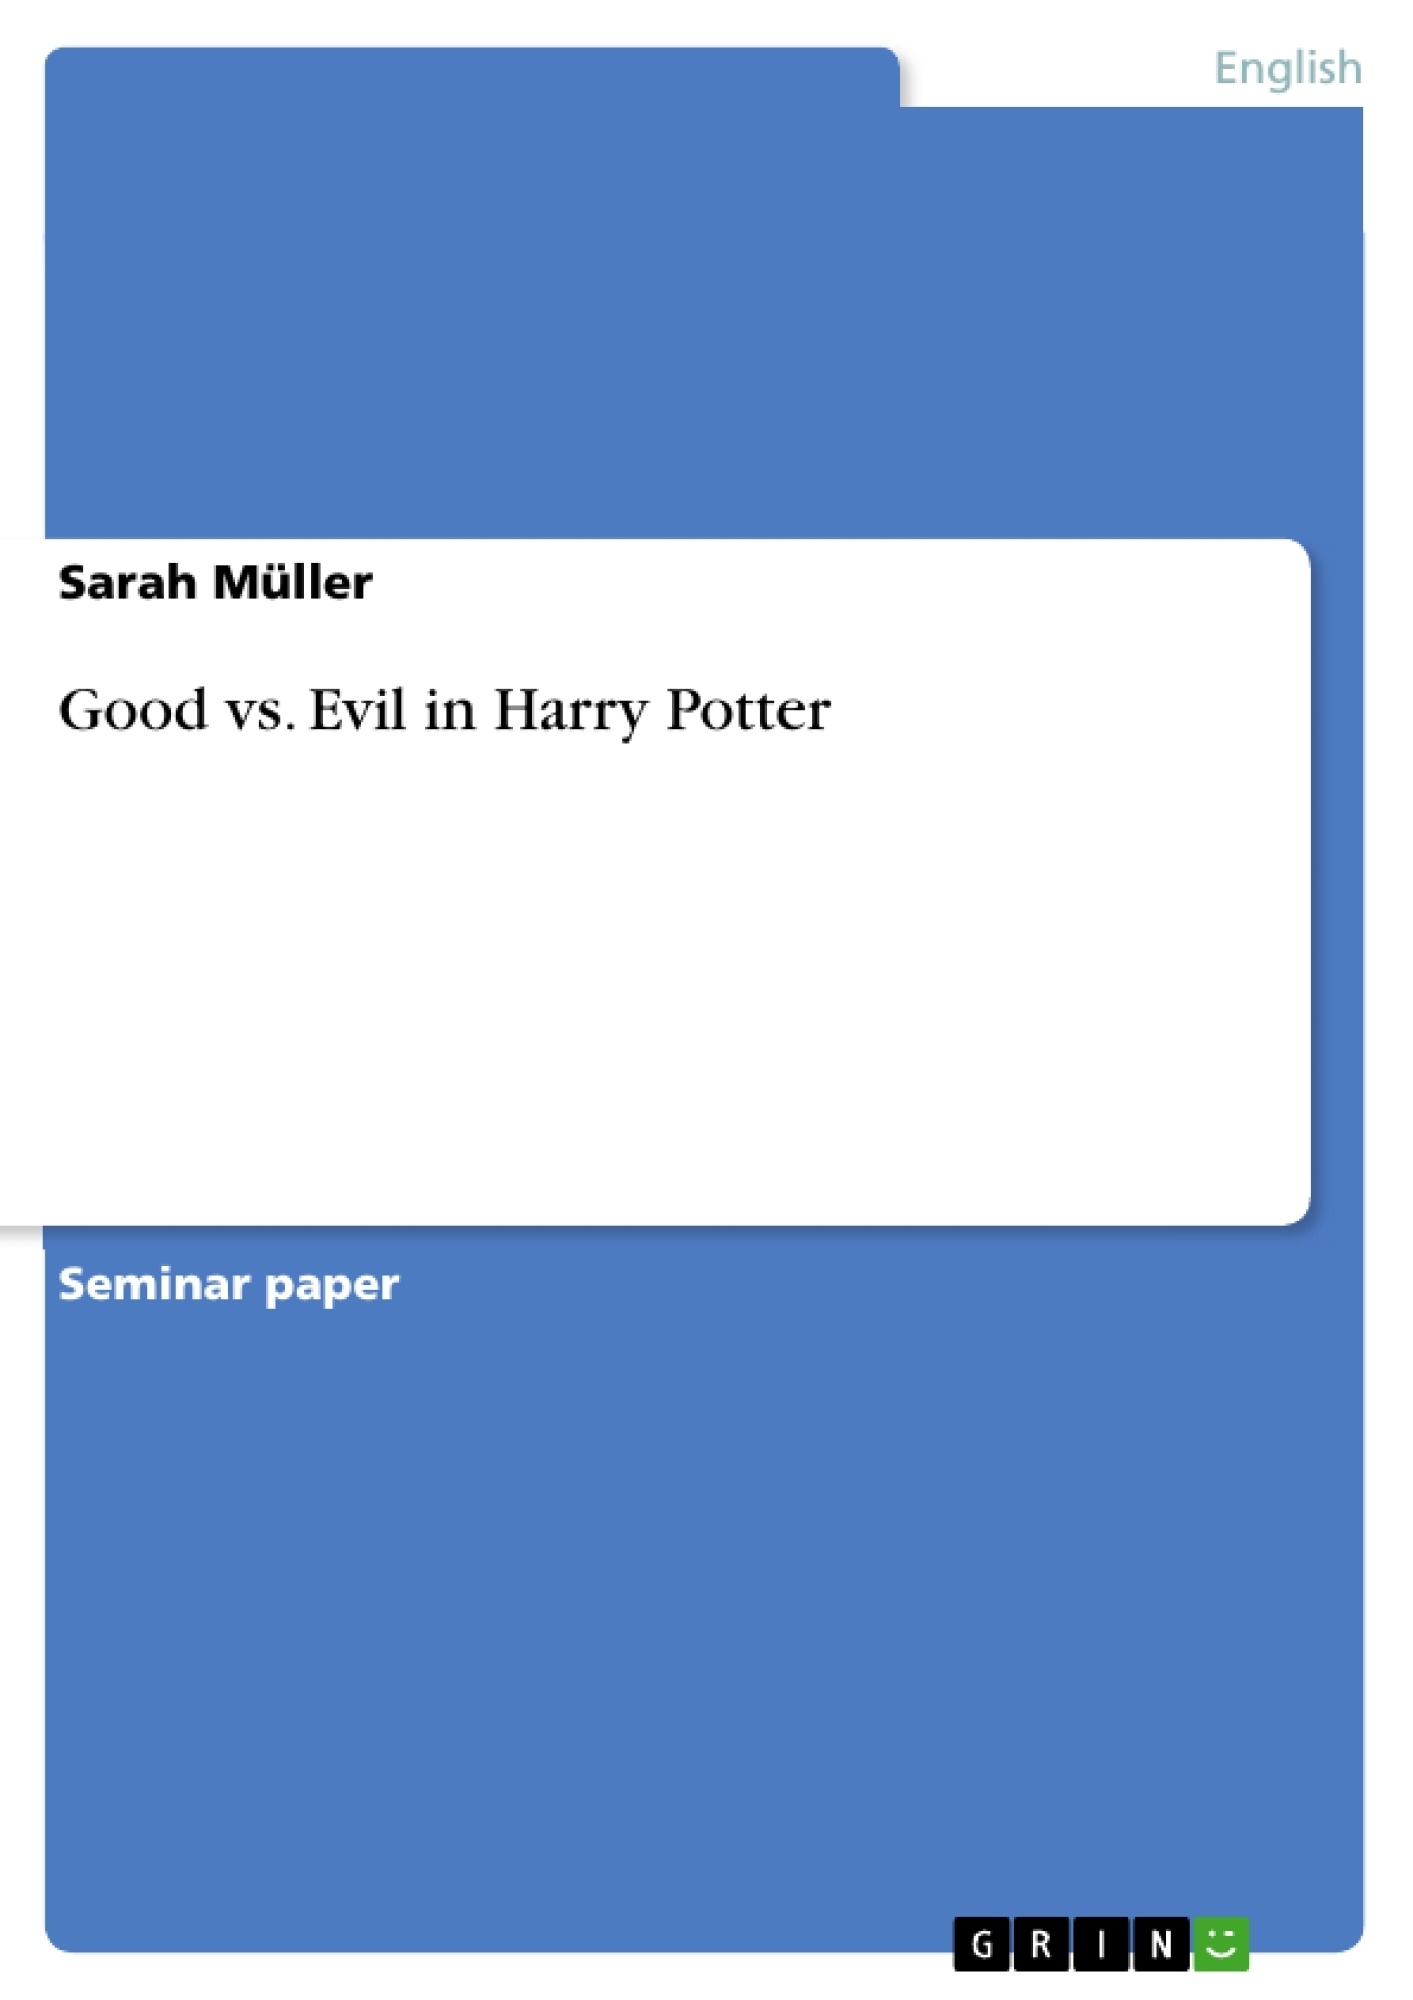 Title: Good vs. Evil in Harry Potter